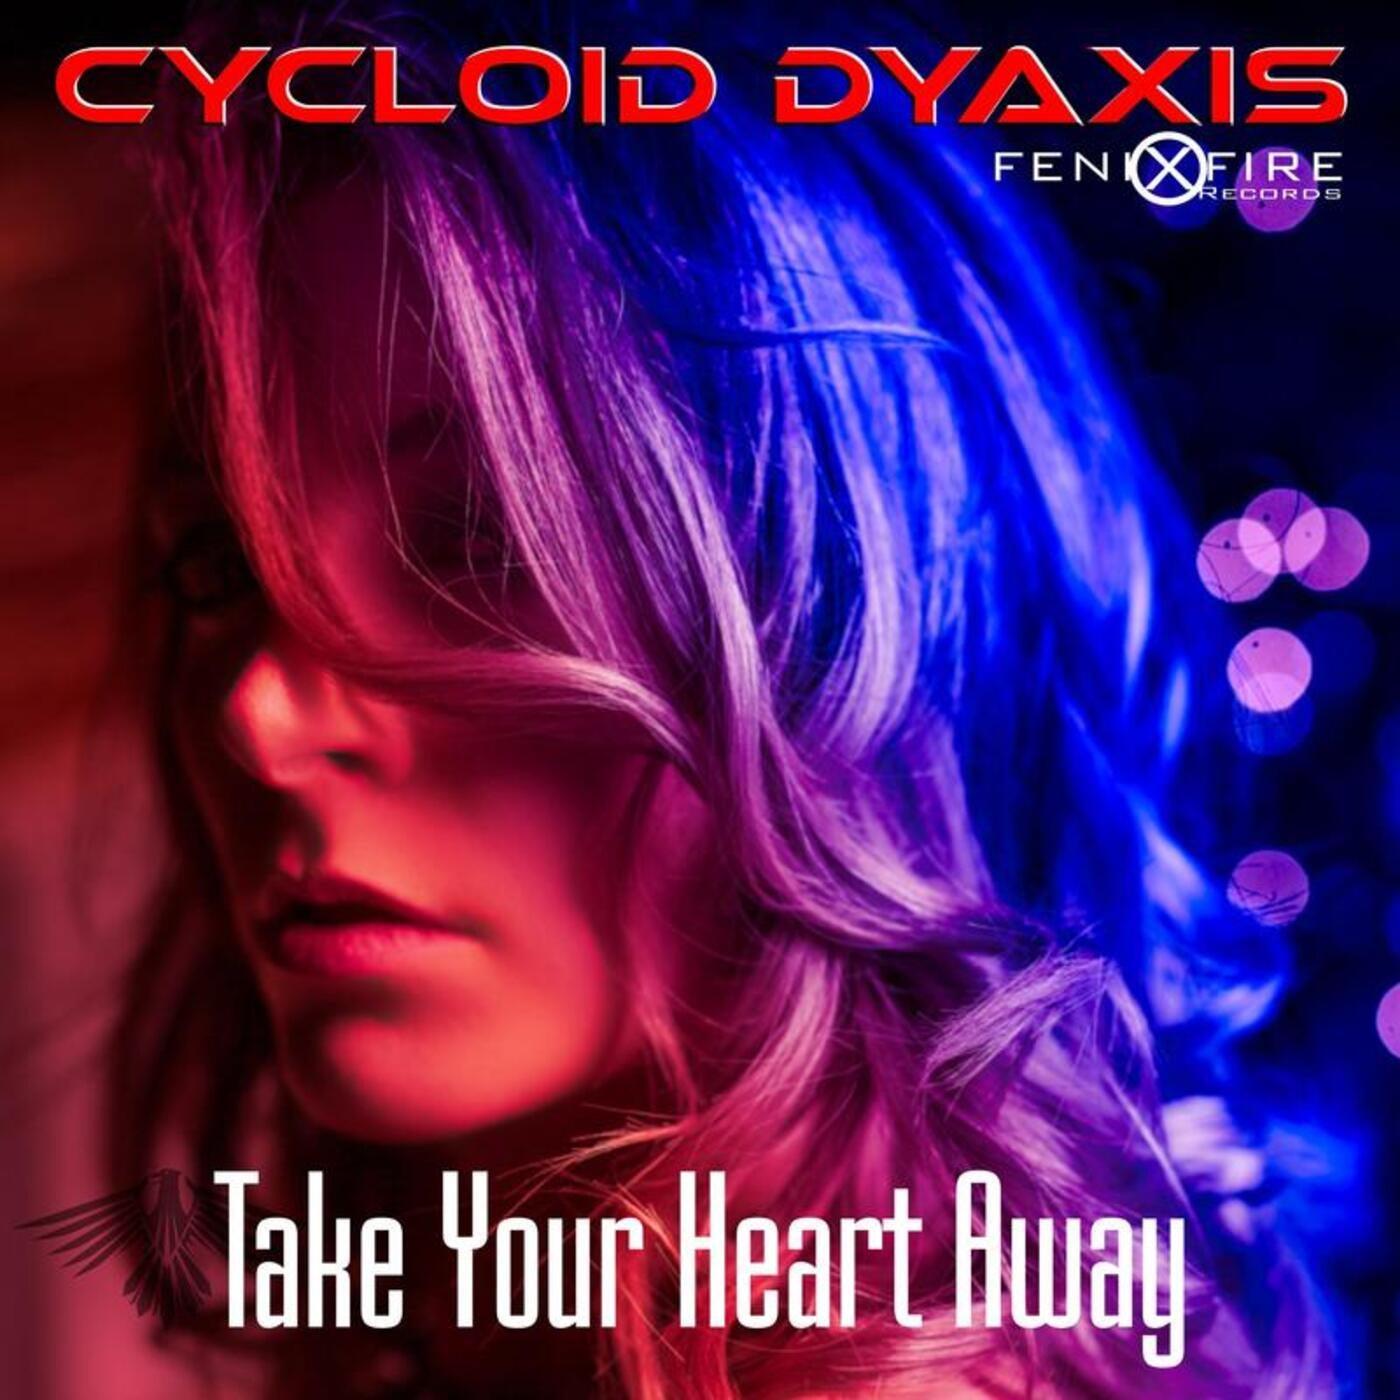 Take Your Heart Away (FenixFire Mix)